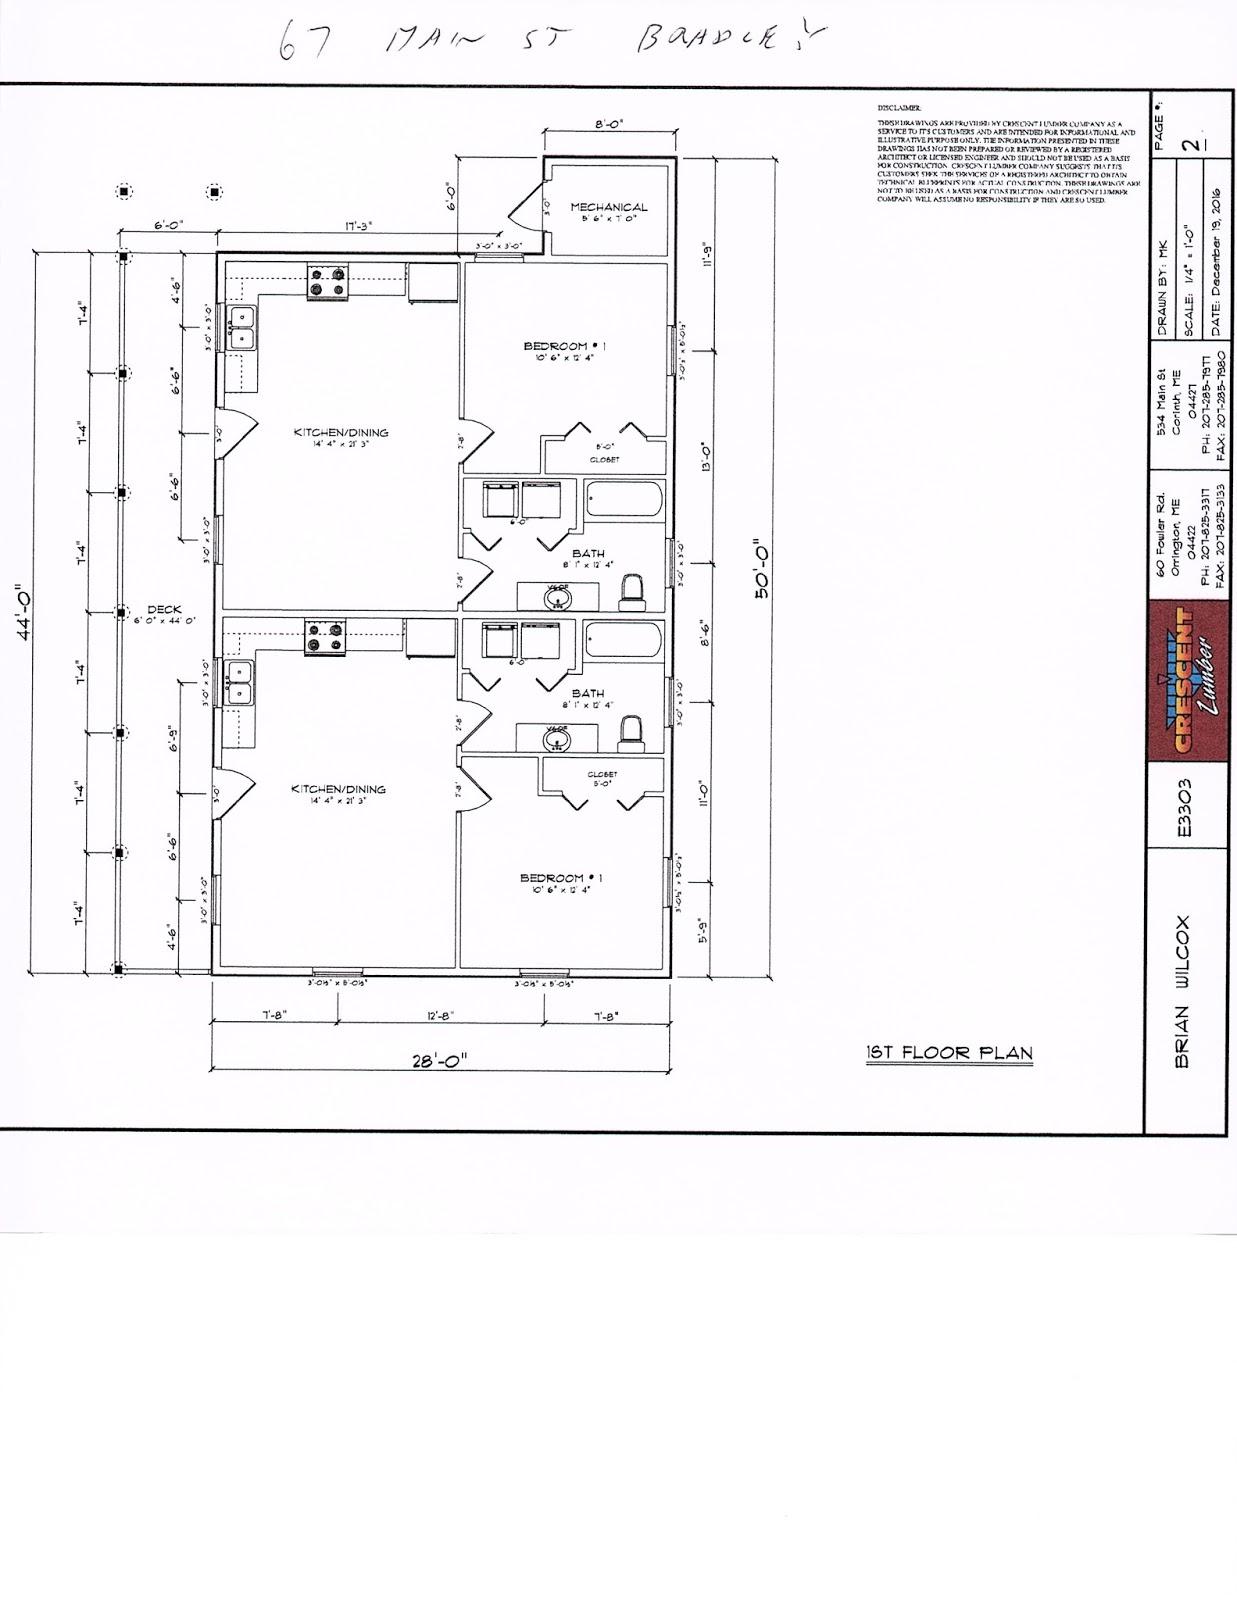 Si Associates Property Management 67 Main Street Bradley